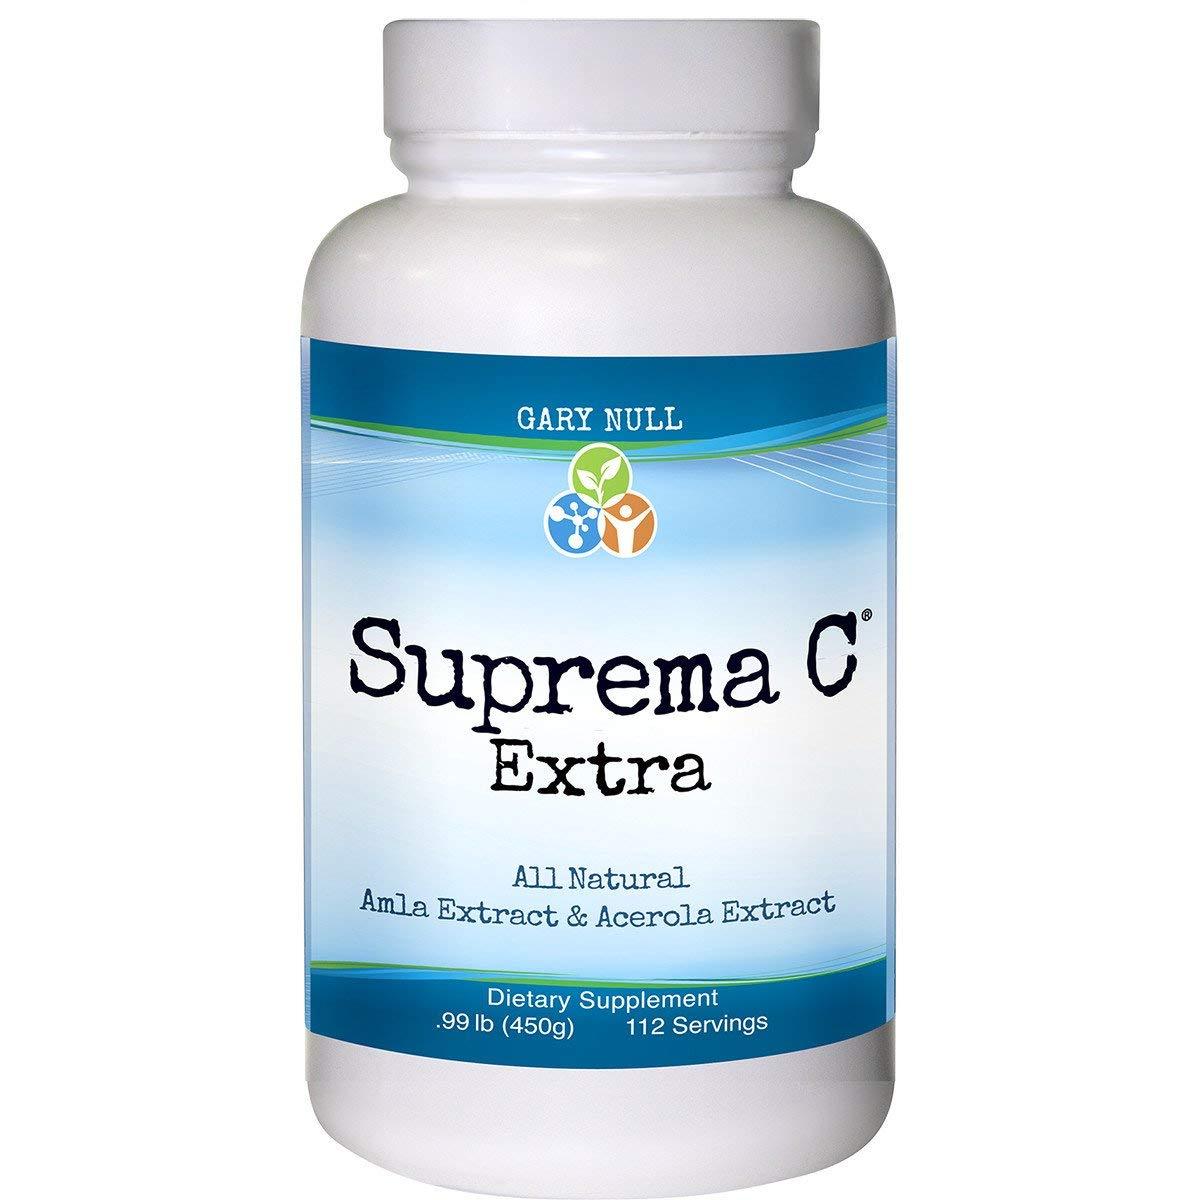 Suprema C Extra